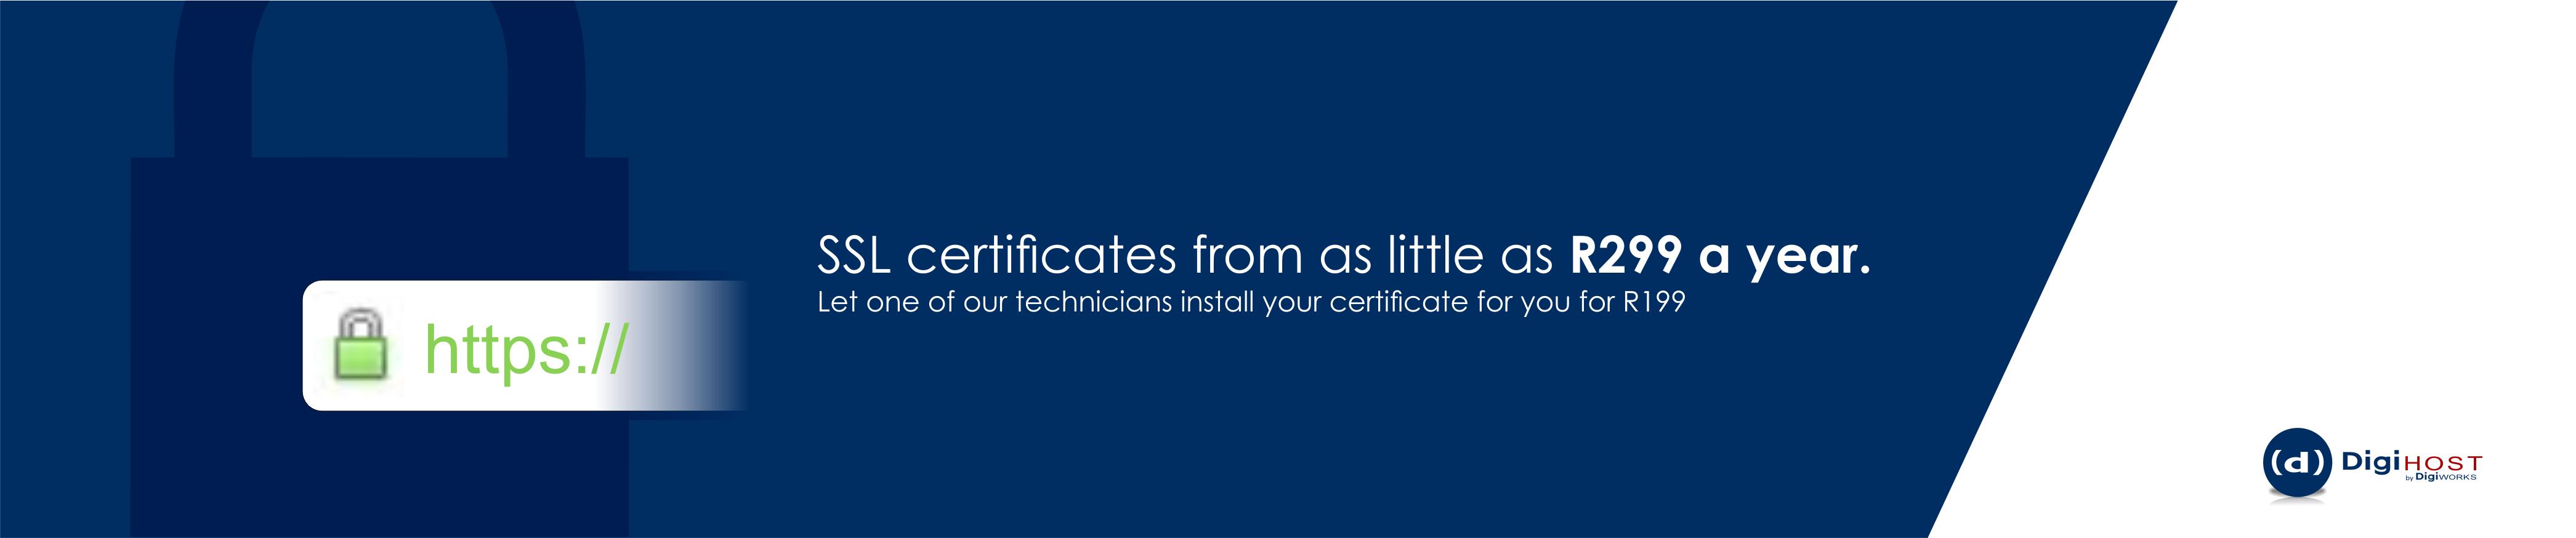 DigiHost SSL certificates